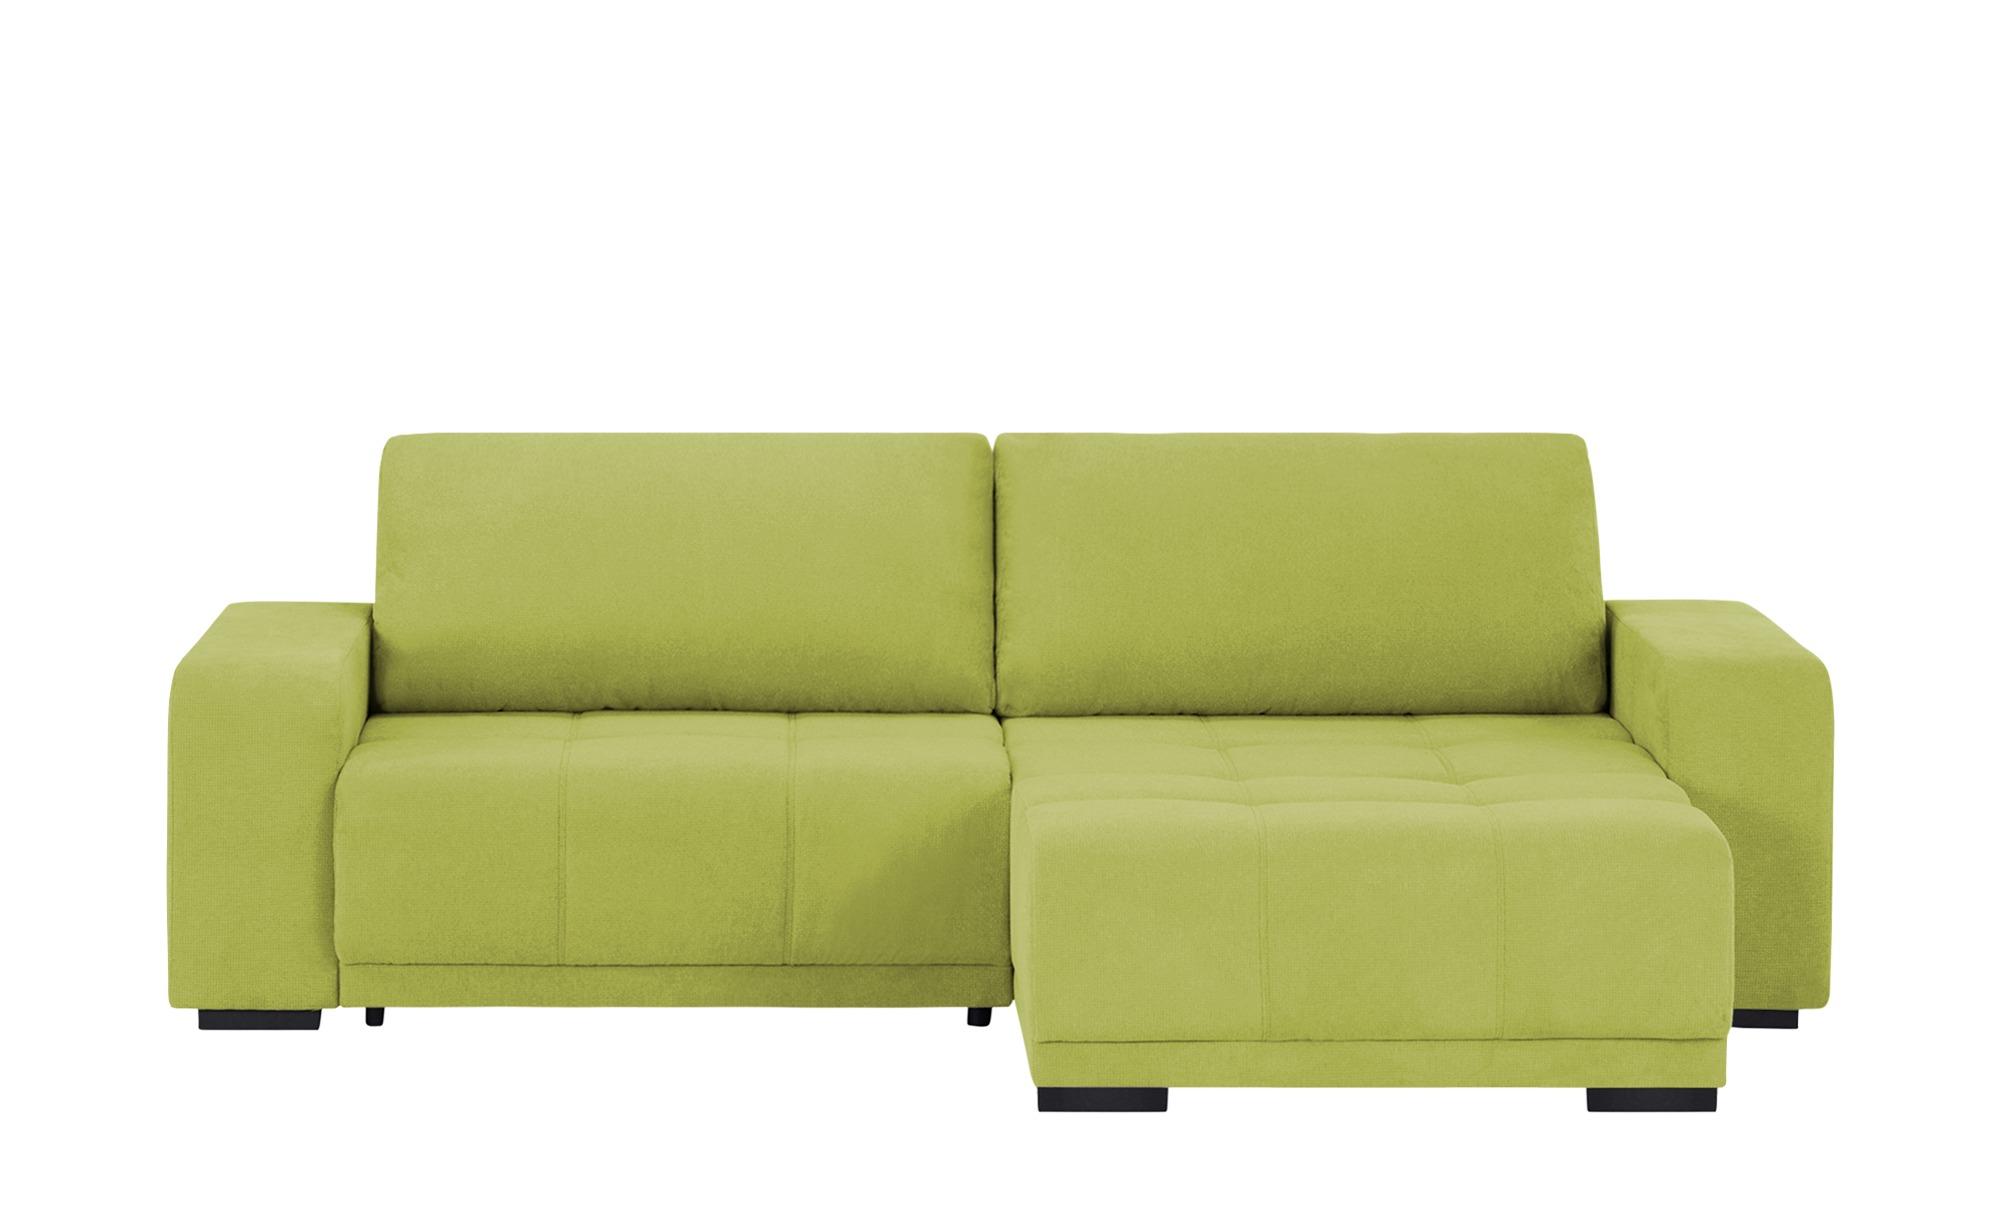 Ecksofa  Mia ¦ grün ¦ Maße (cm): H: 73 Polstermöbel > Sofas > Ecksofas - Höffner